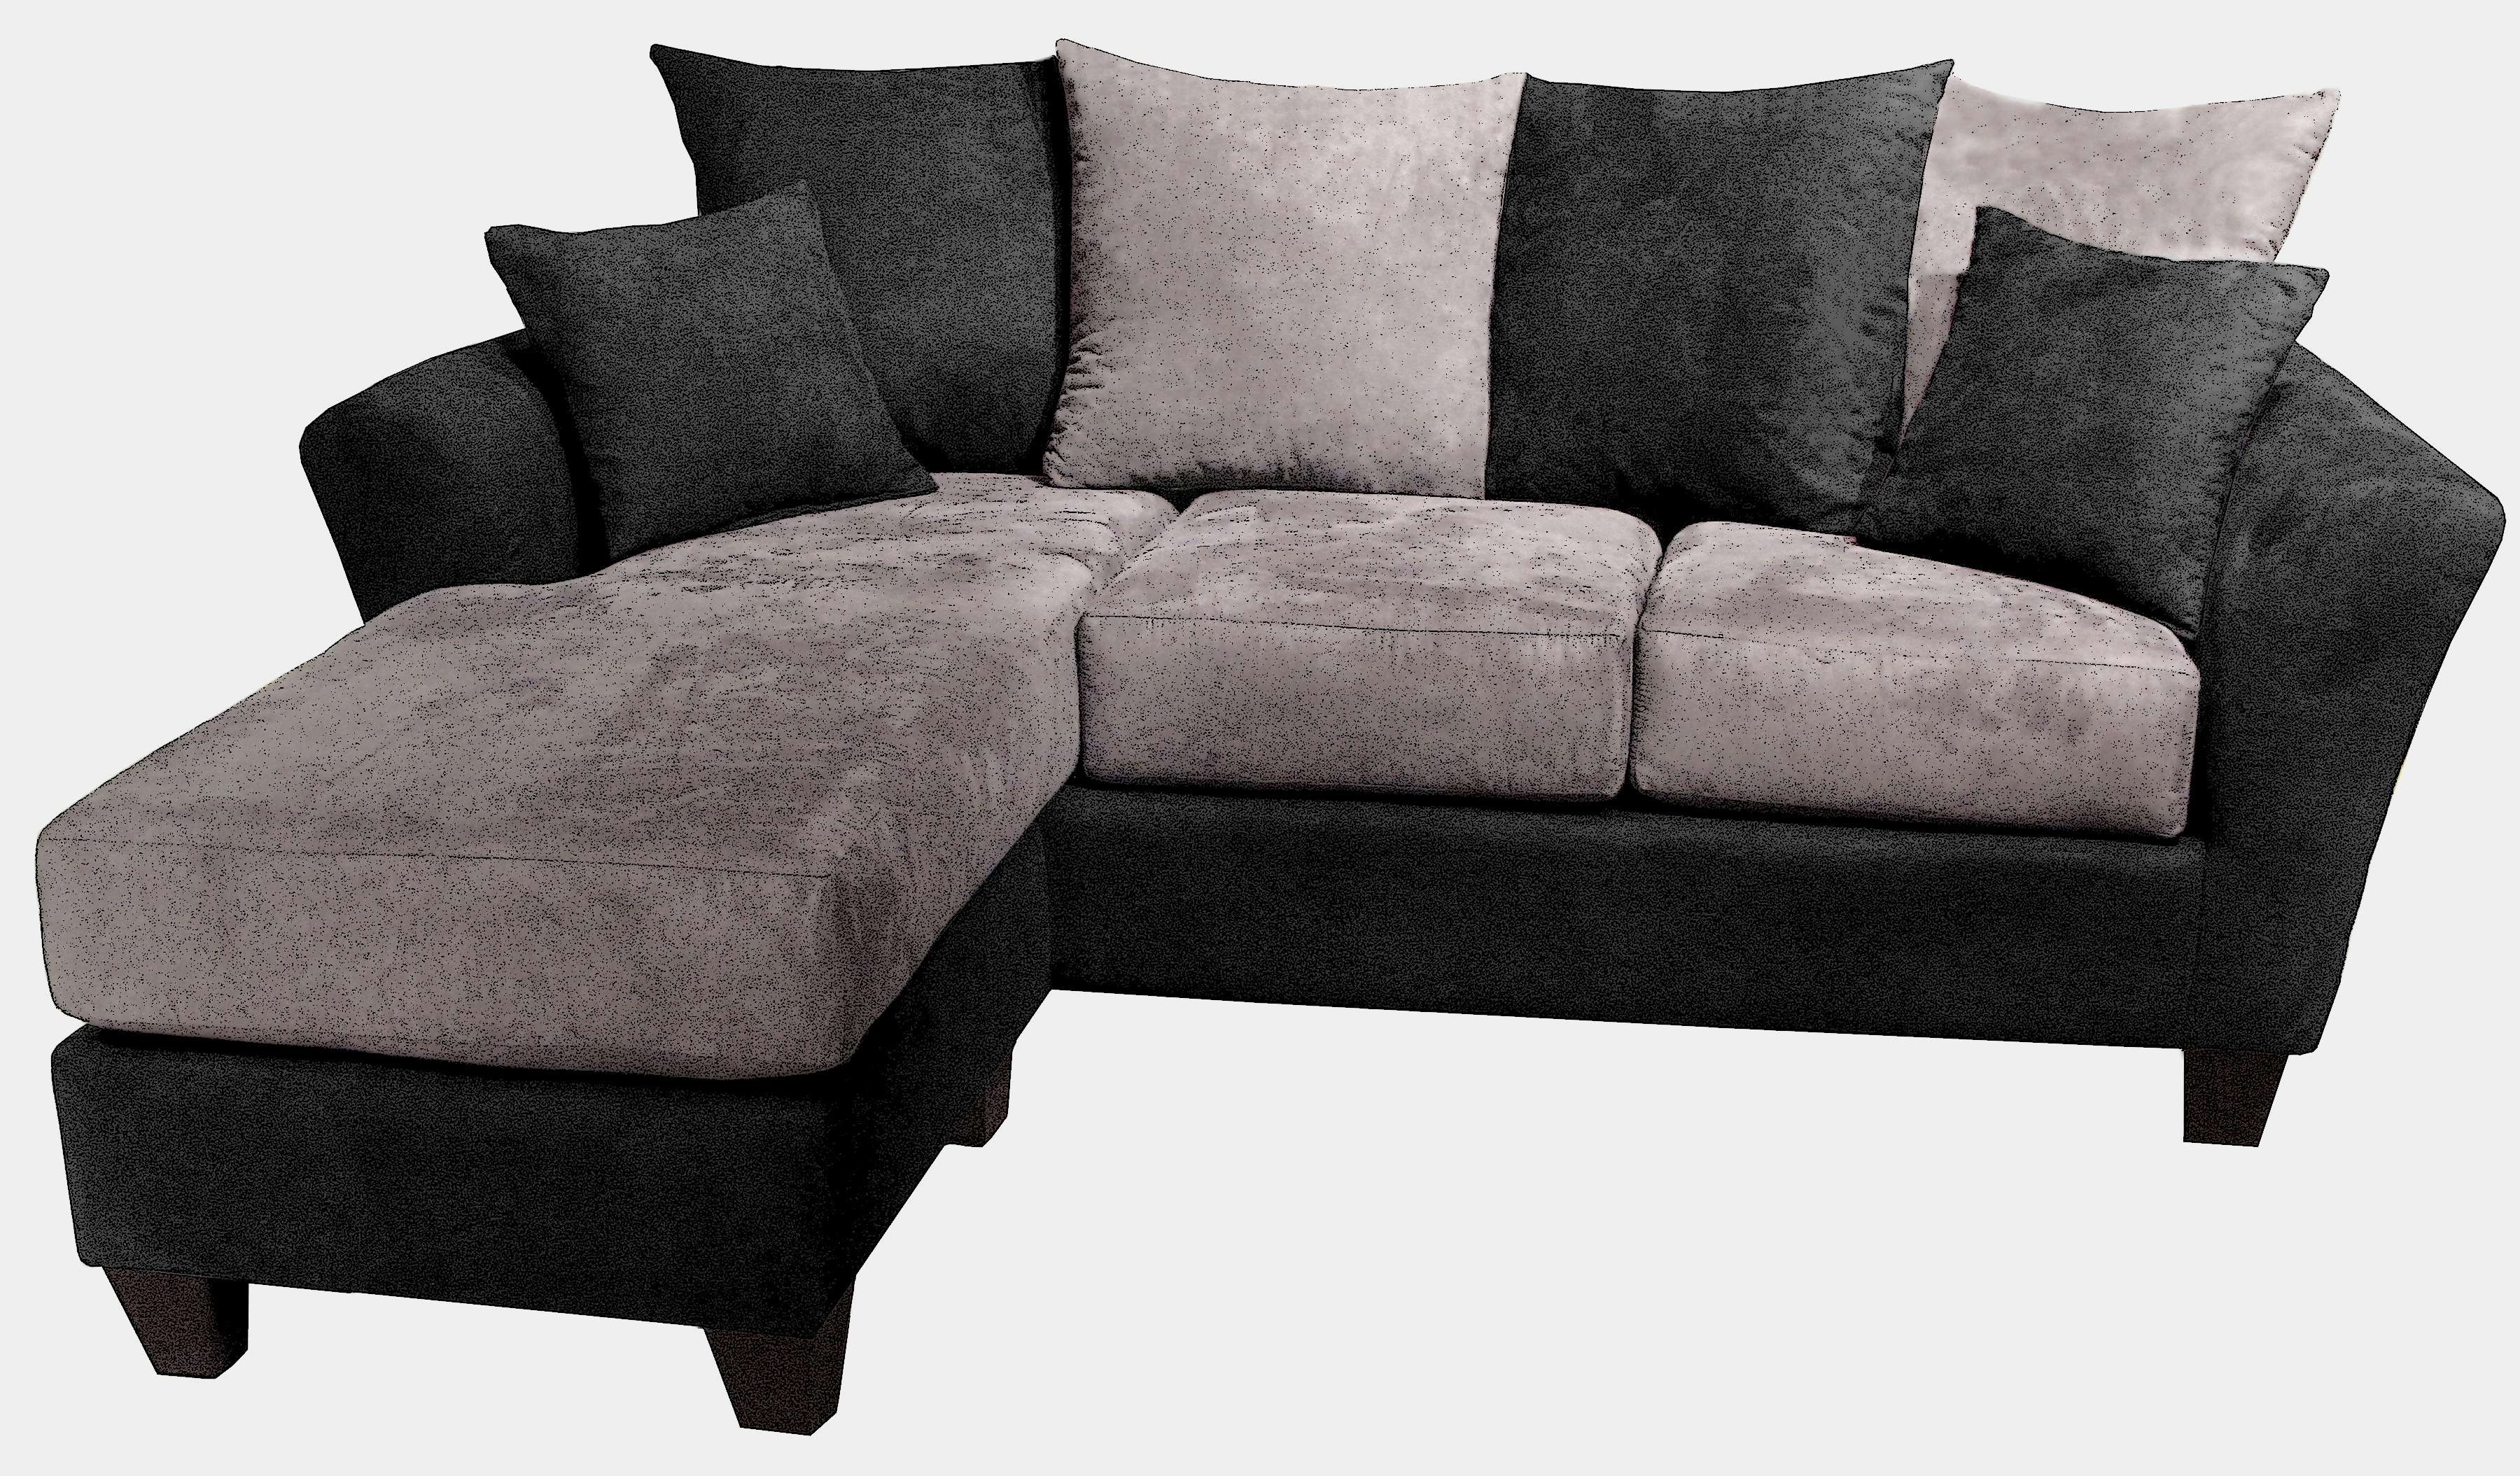 Furniture Amp Mattress Discount King 2750 Paxton St